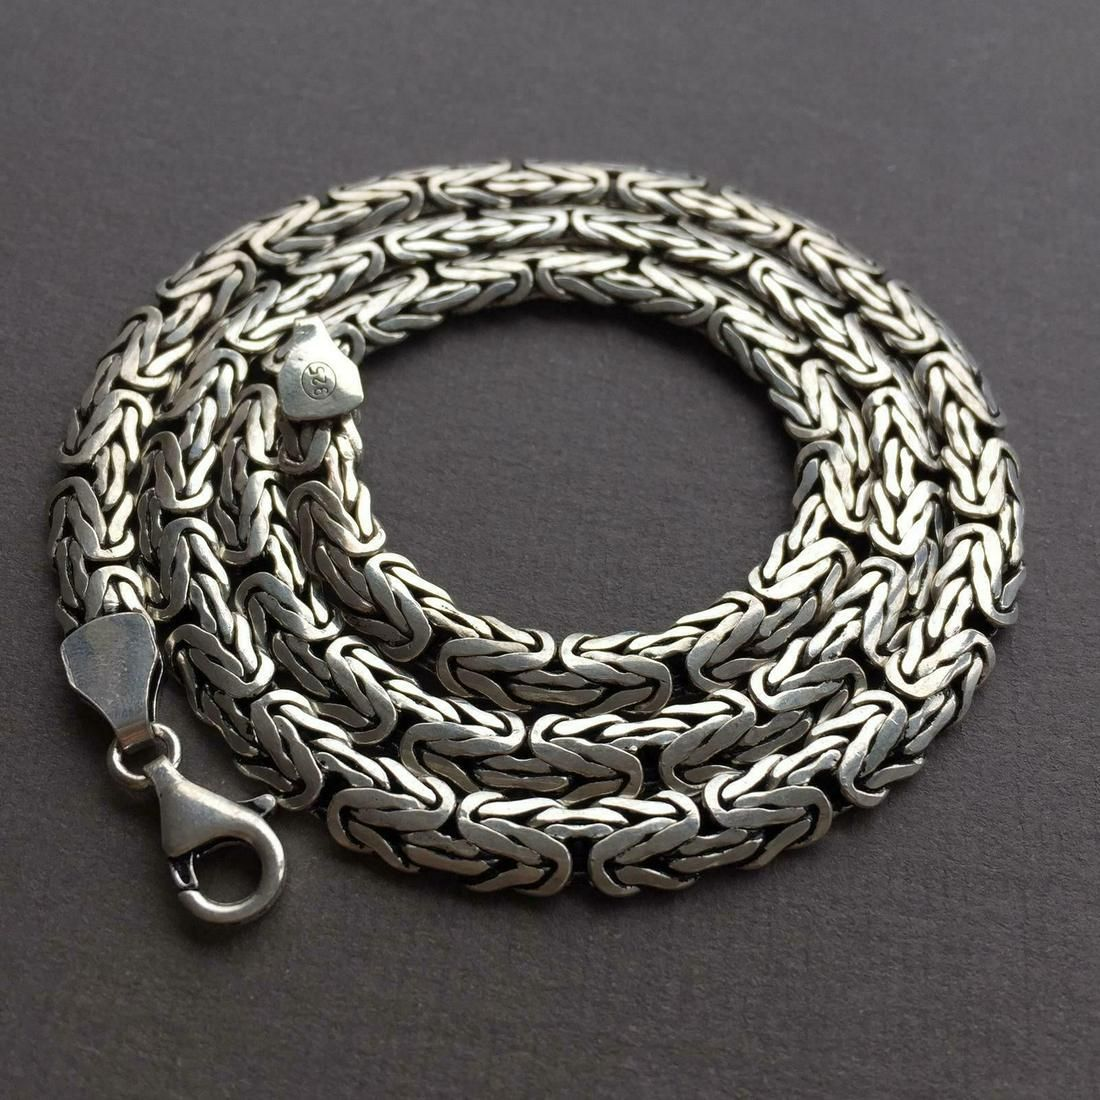 26Inch Mens Bali King Byzantine Chain Necklace 925